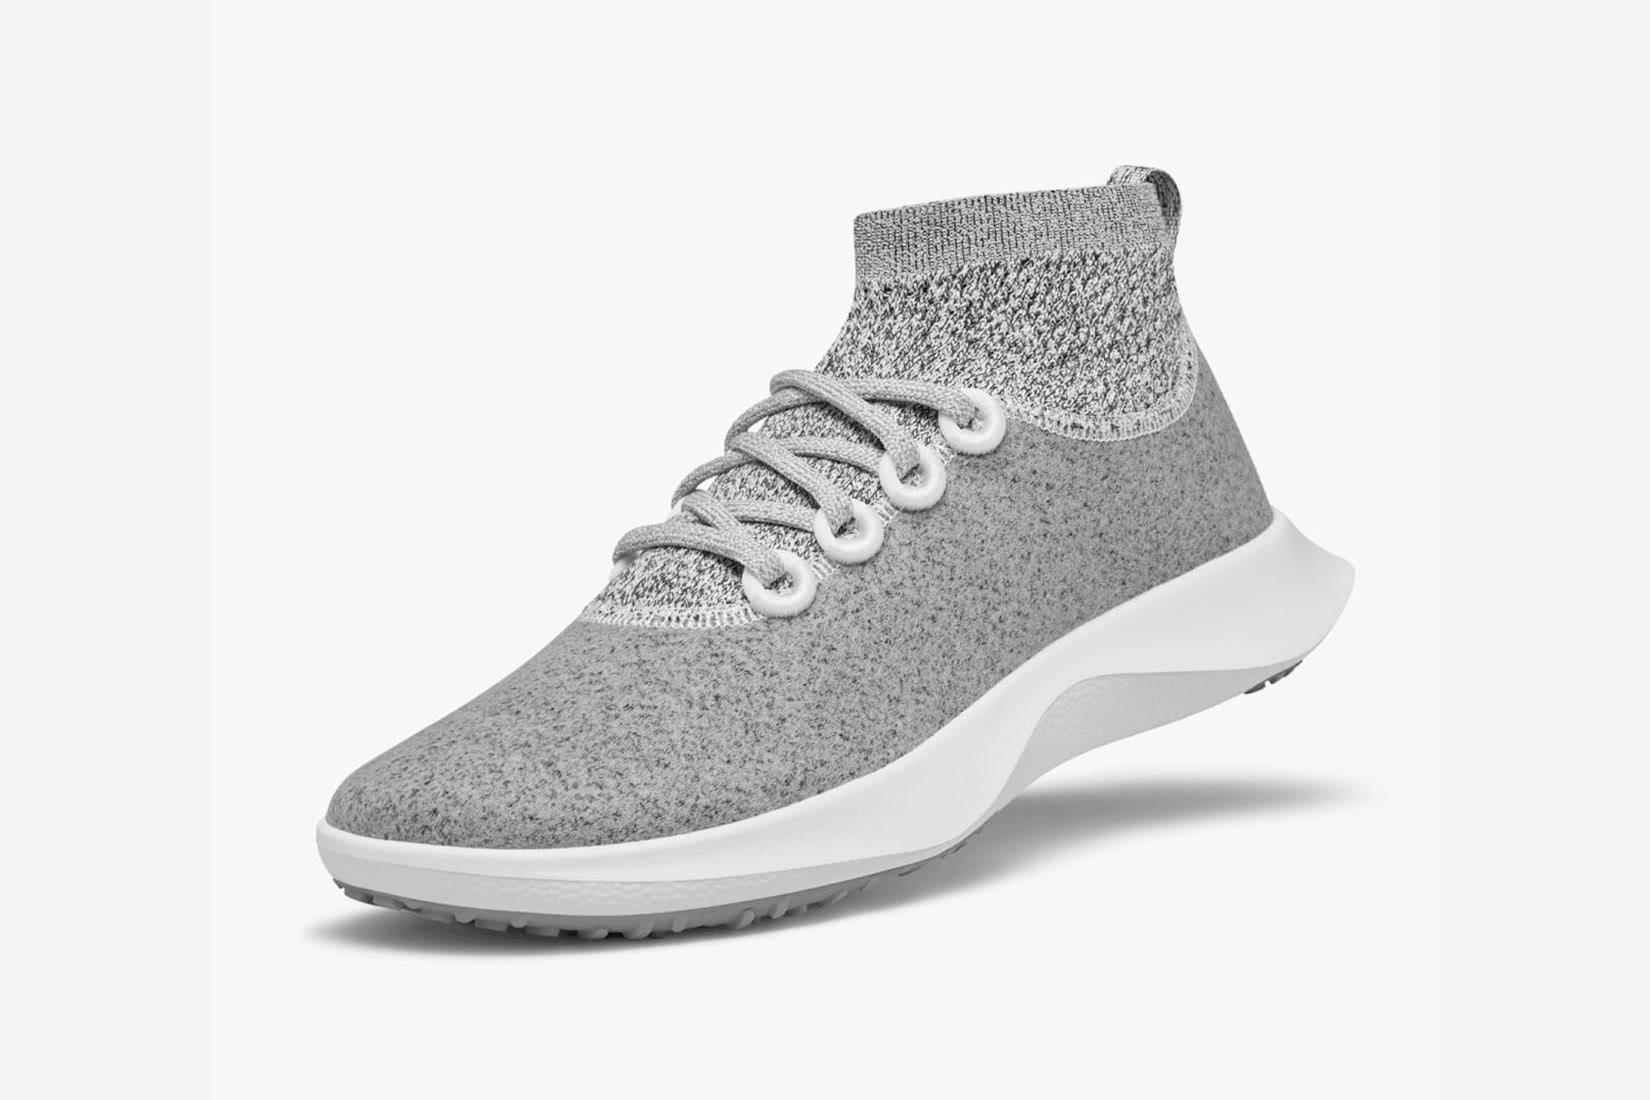 Allbirds sneakers review running wool dasher mizzles - Luxe Digital